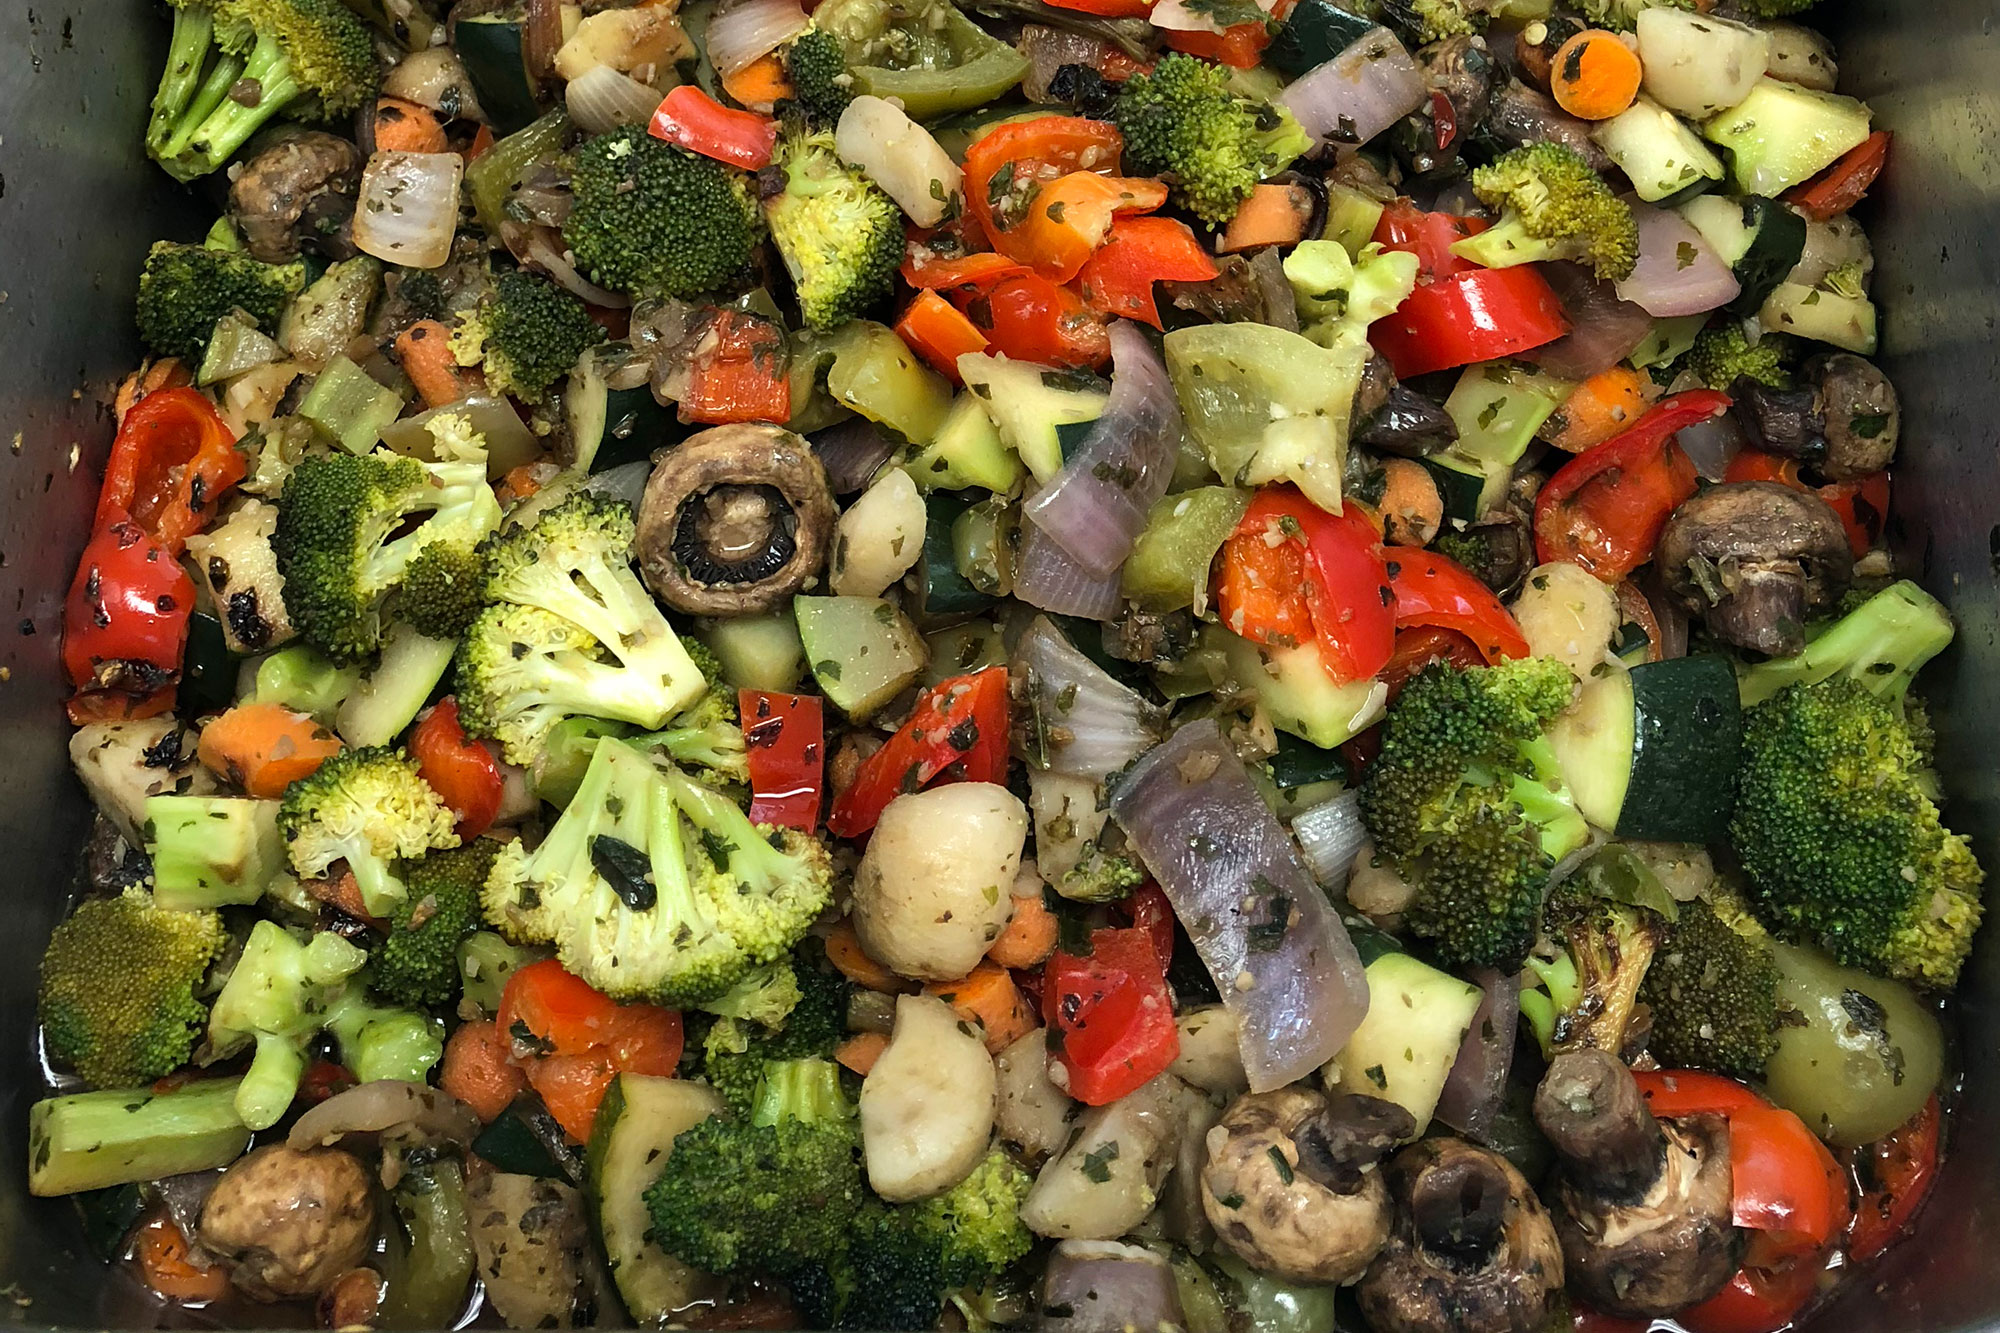 Vegetables Menu | Broken Plate Catering, Manitowoc Wisconsin